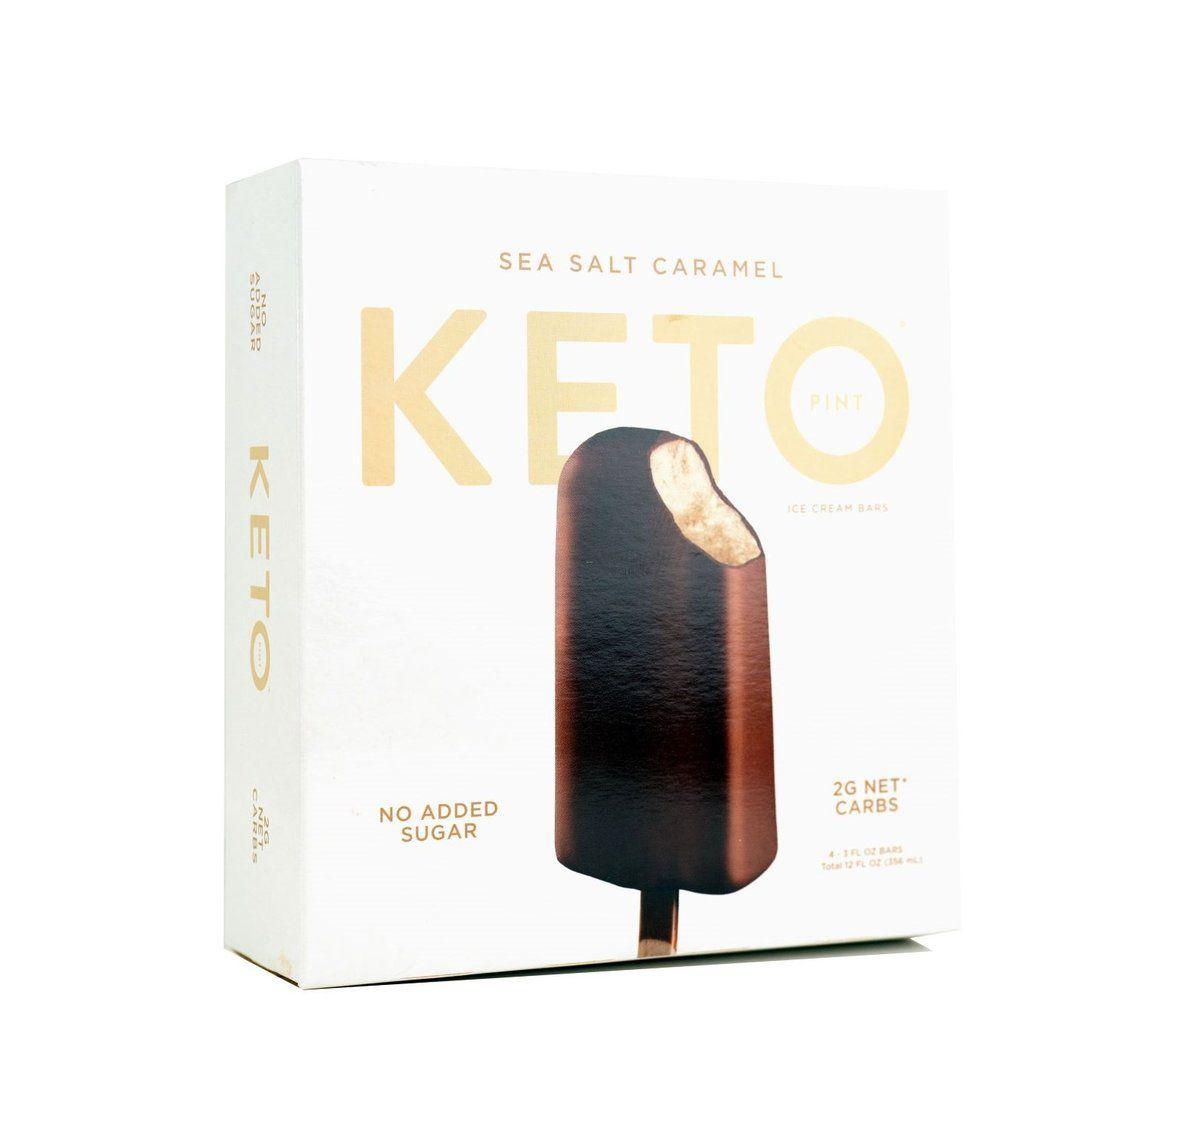 keto-pint-sea-salt-caramel-ice-cream-bars